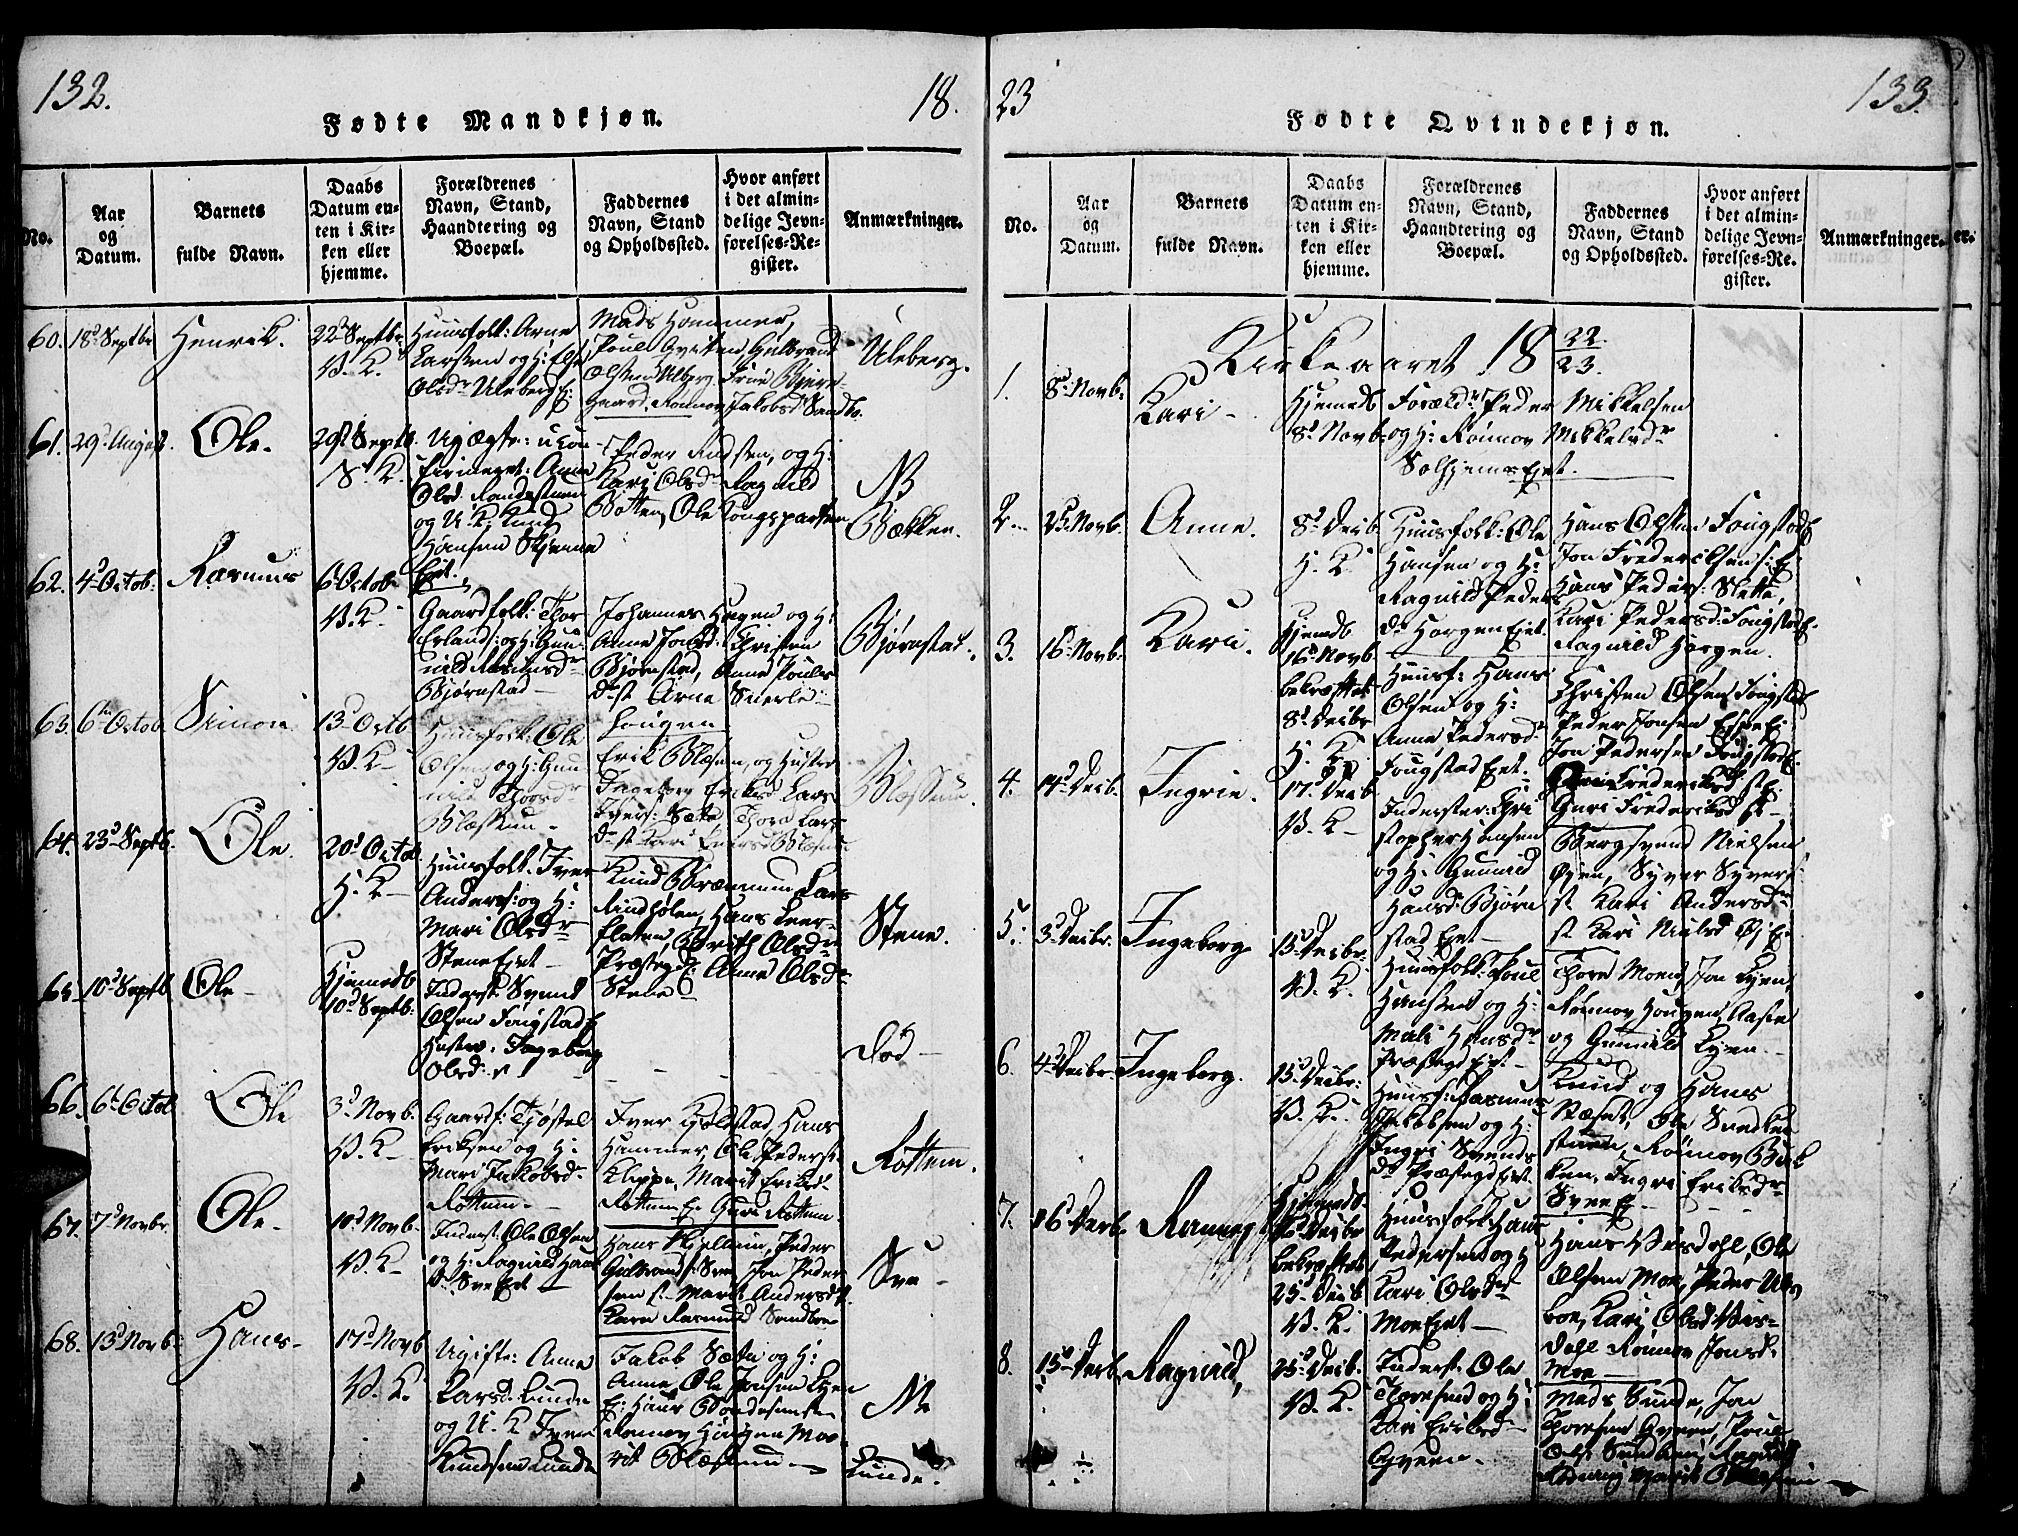 SAH, Vågå prestekontor, Ministerialbok nr. 3, 1815-1827, s. 132-133